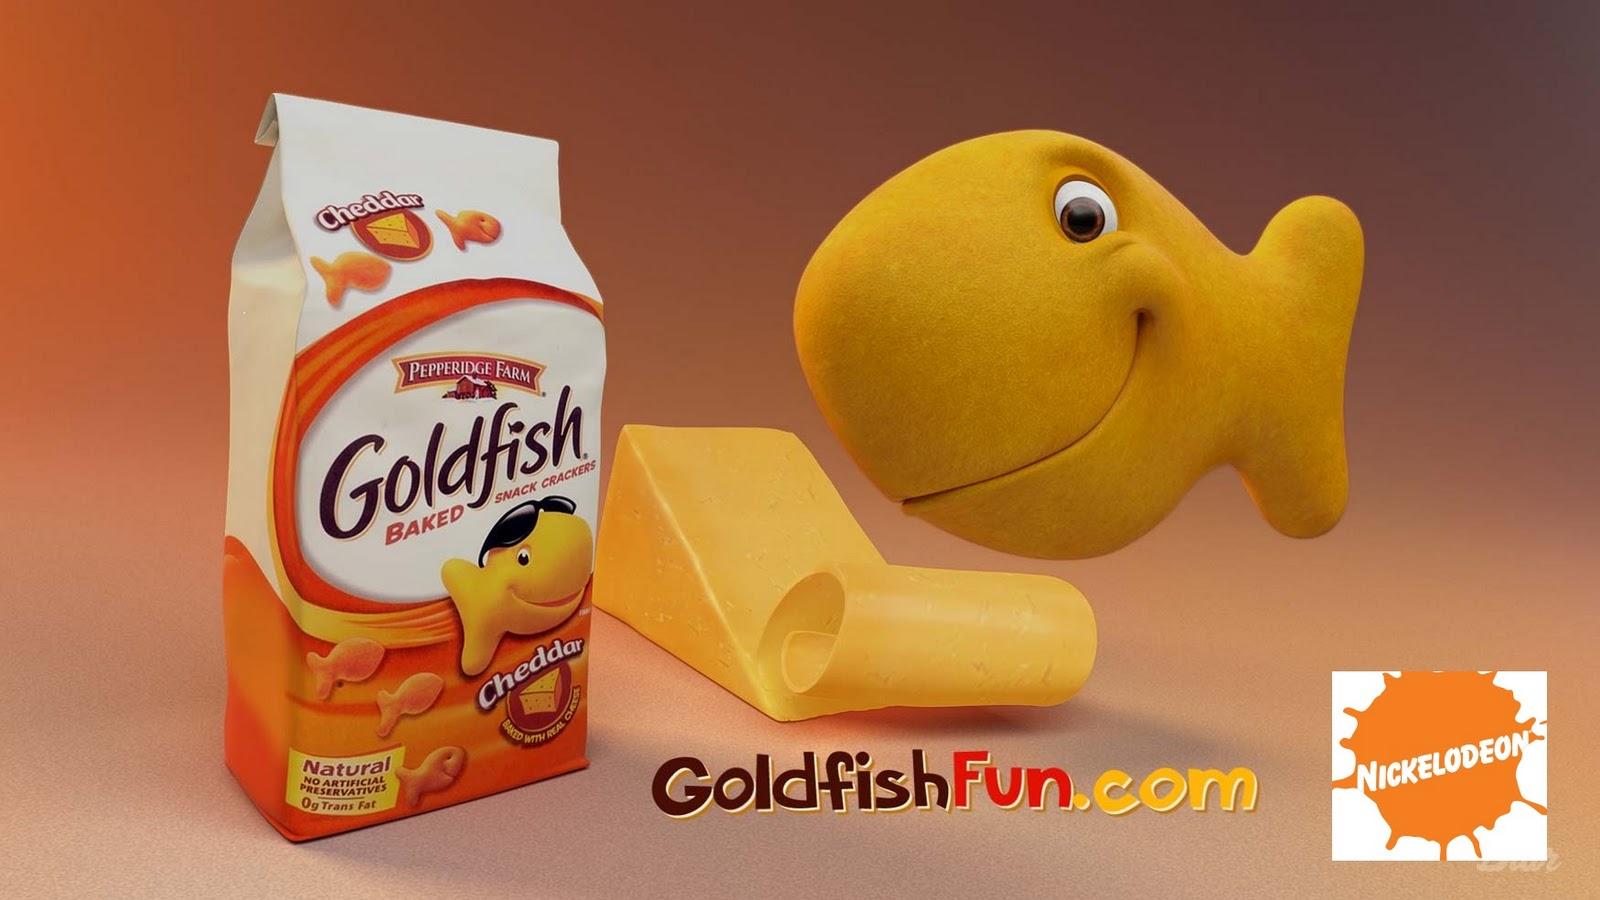 http://1.bp.blogspot.com/_QAoPzZehXJQ/TGvq2uRuK_I/AAAAAAAAAAo/-5D38fWEHtA/s1600/special_goldfish_hires_081.jpg